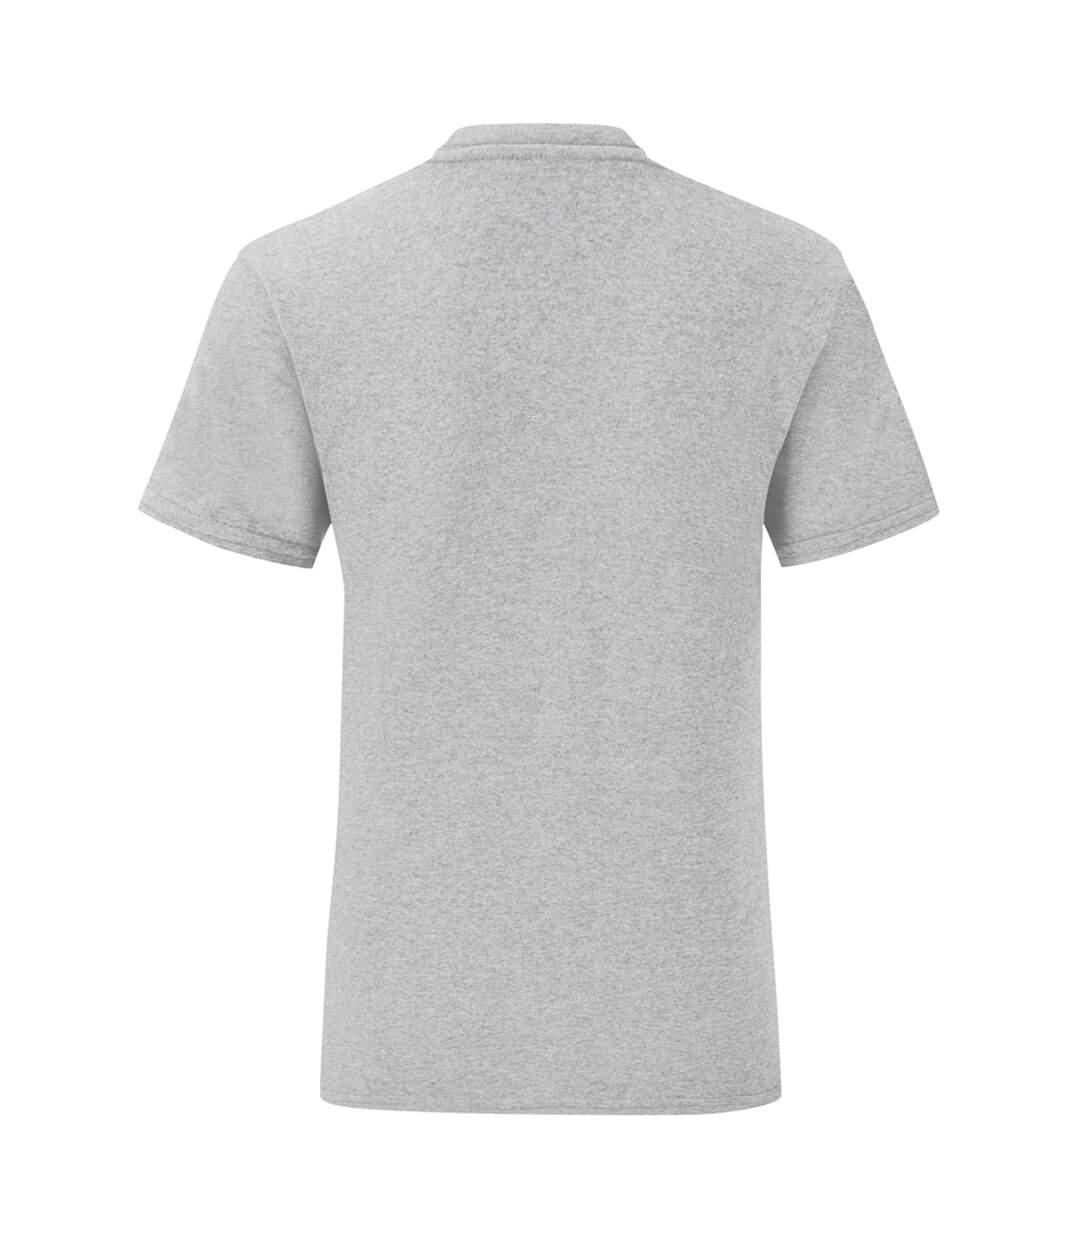 Fruit Of The Loom Mens Iconic T-Shirt (Pack Of 5) (Zinc Grey) - UTPC4369